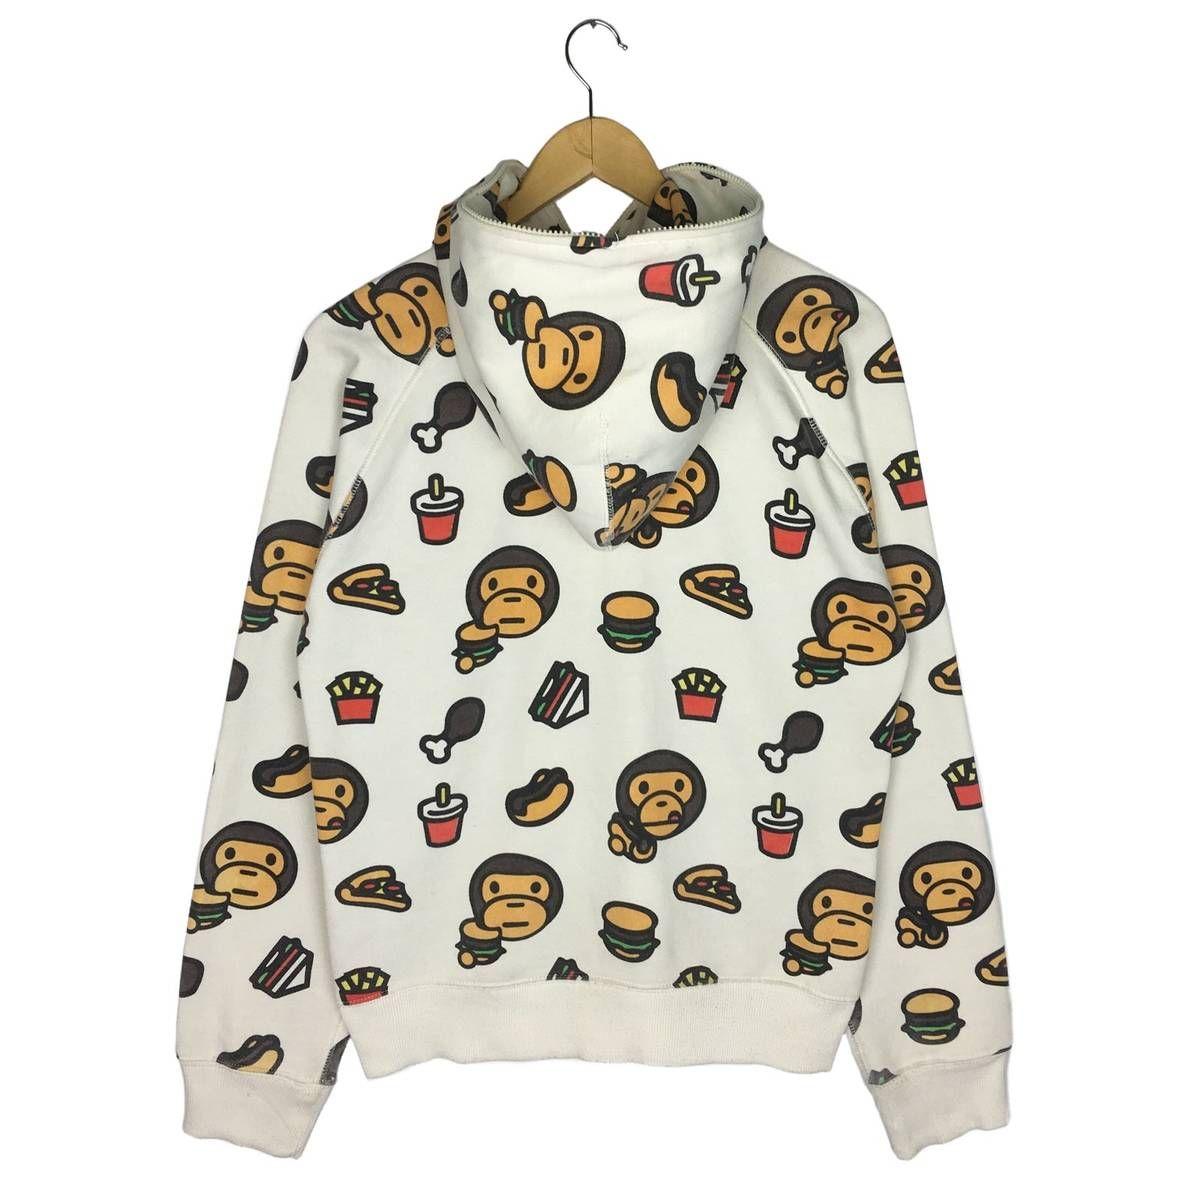 8ebb0e157b1 Bape A Bathing Ape Baby Milo Junk Food Hoodie Fullzip Size m - Sweatshirts    Hoodies for Sale - Grailed